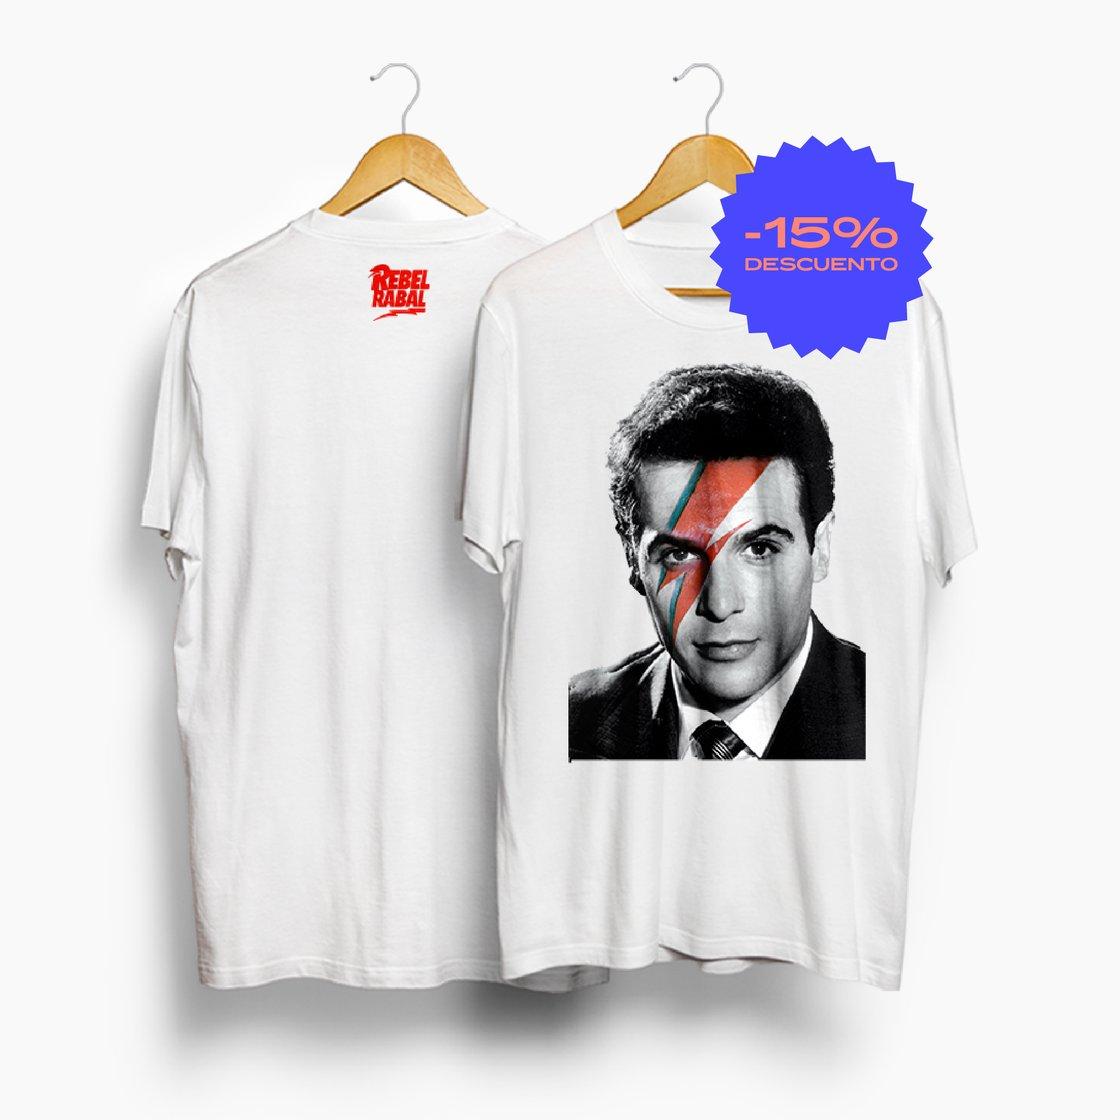 Image of Camiseta Rebel Rabal